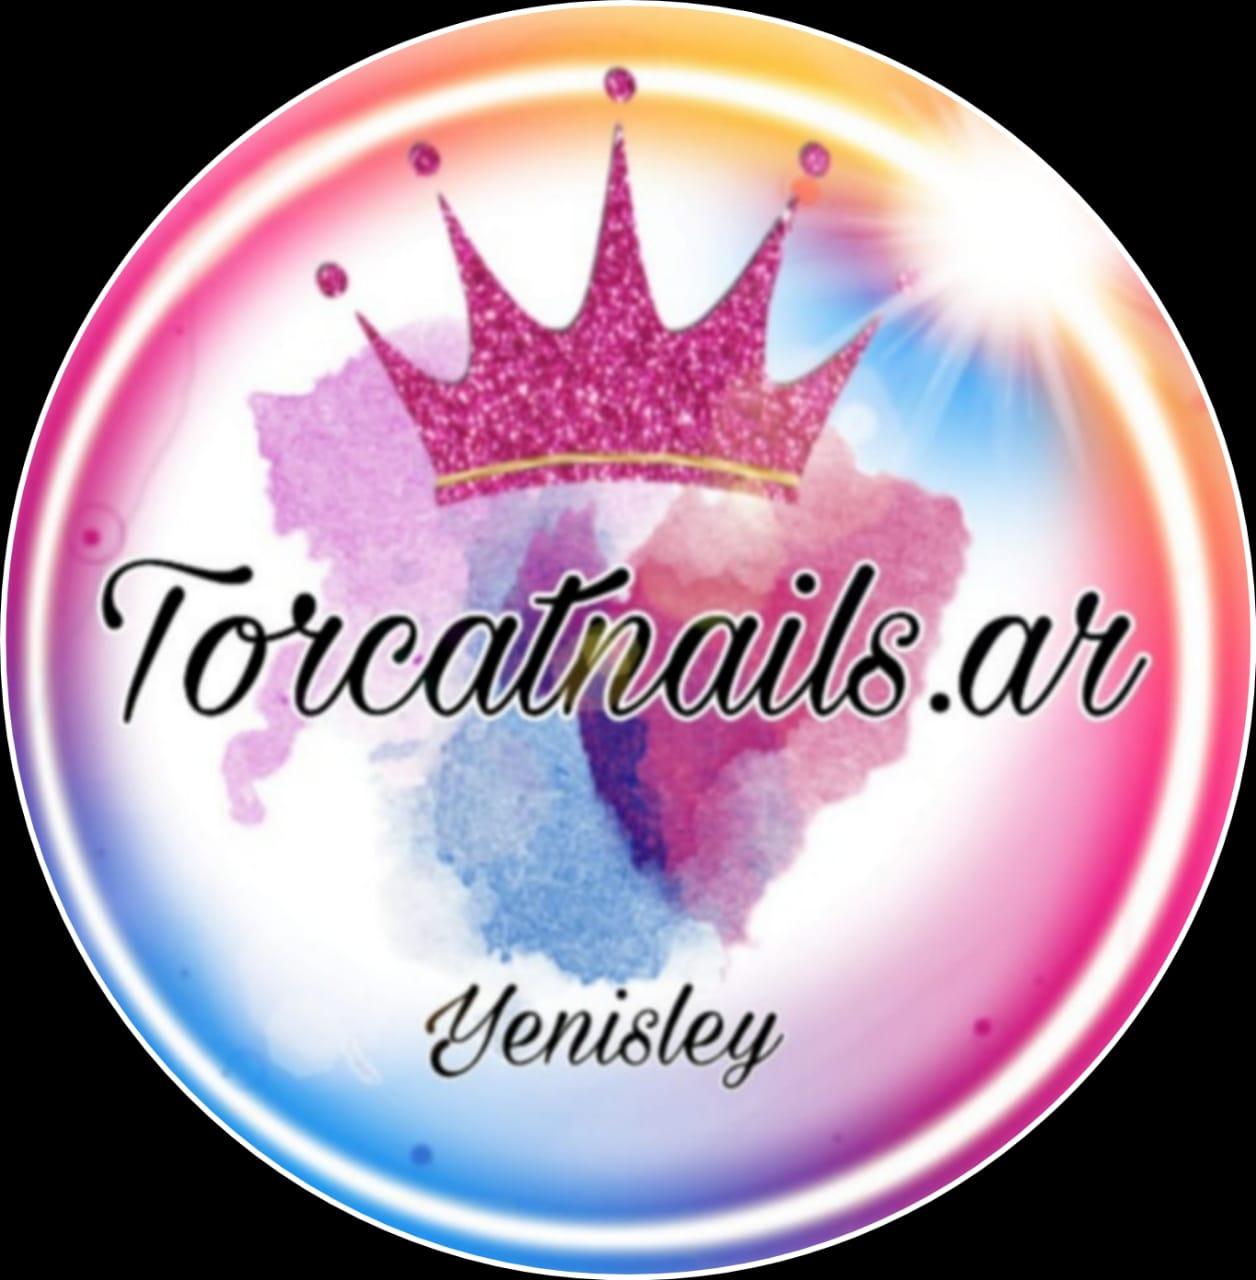 Torcatnails